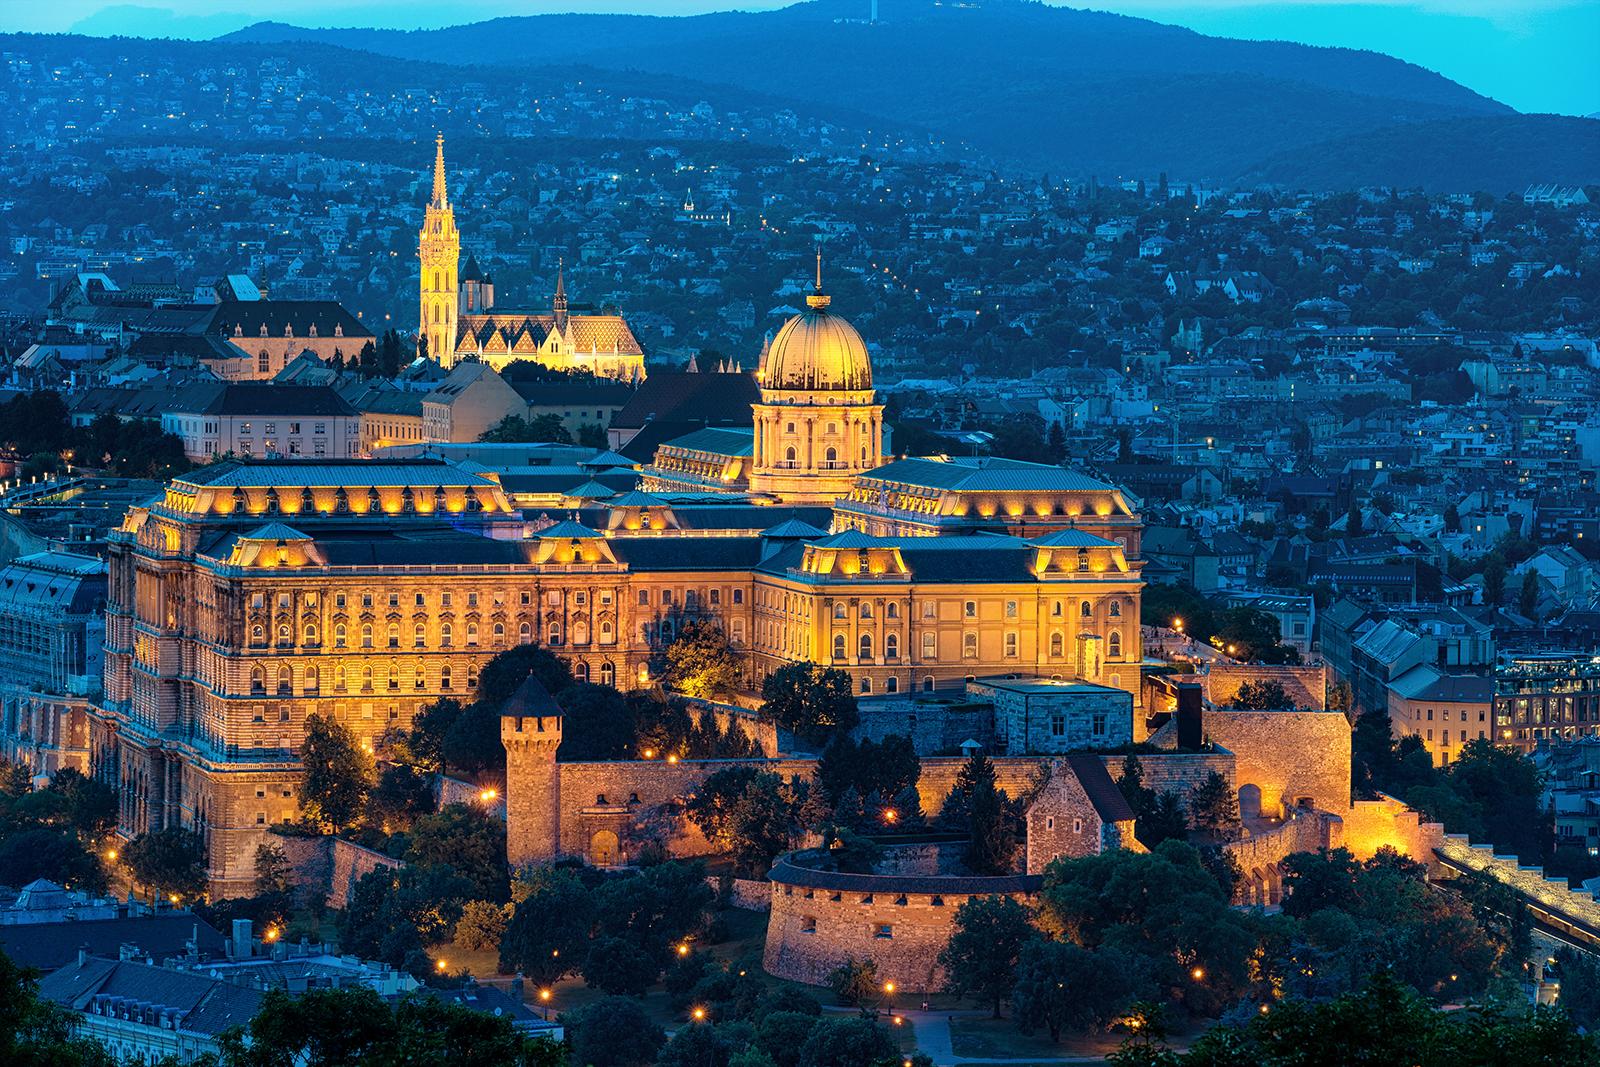 Castle, Budapest, Hungary, longexposure, Sony a7iii, sony 70-200 F2.8, Budapest with the Sony A7III